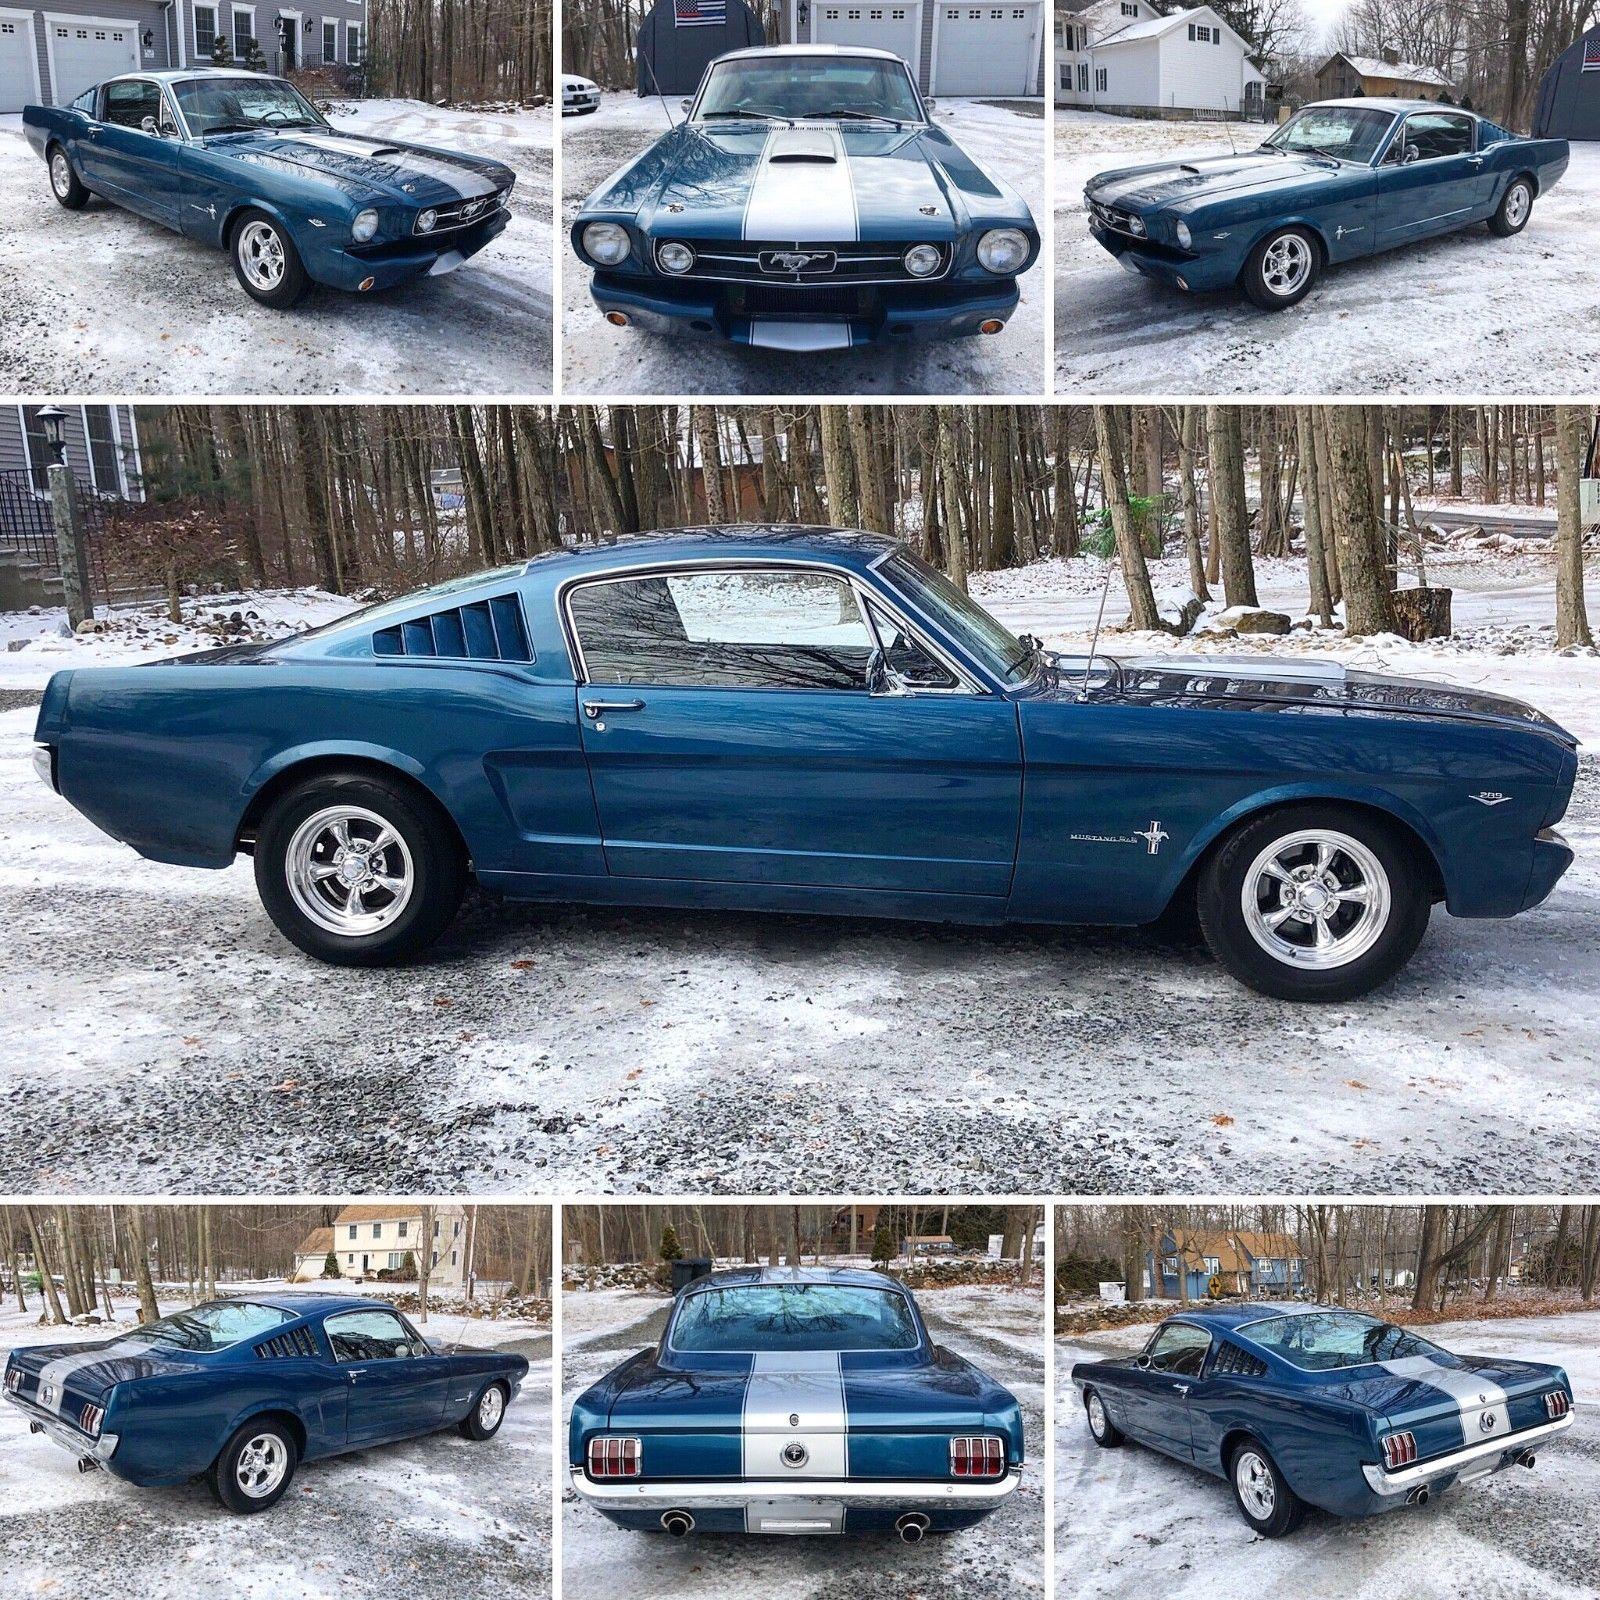 1965 ford mustang mustang fastback 1965 ford mustang fastback 2 2 289 v 8 with pony interior 29999 00 29999 00